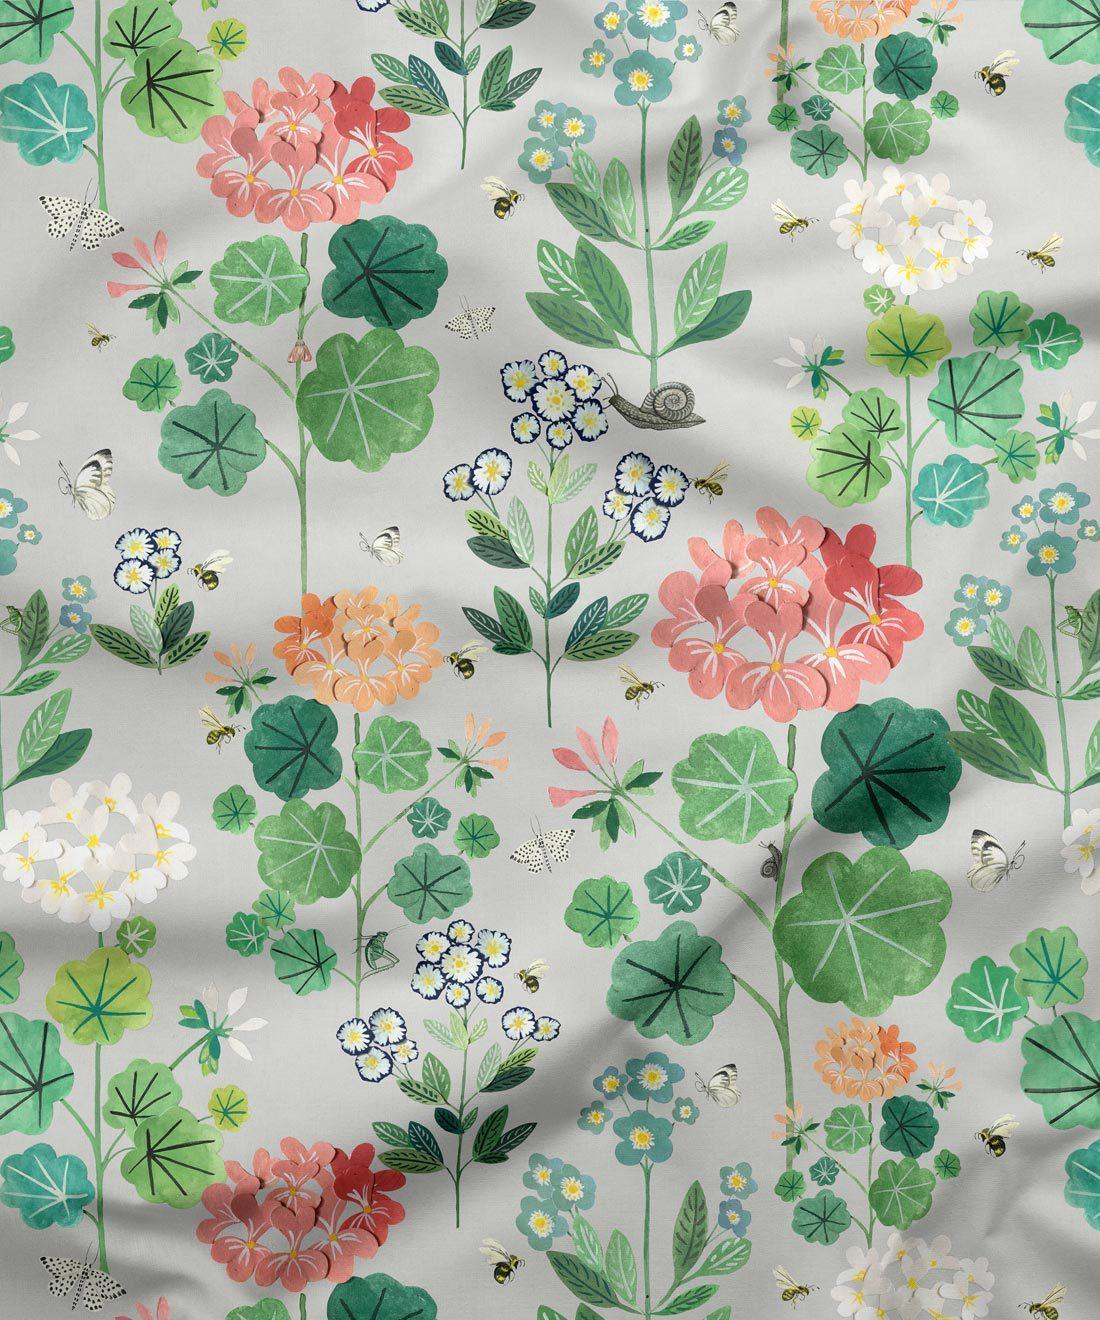 Sophie's Garden Fabric Cream